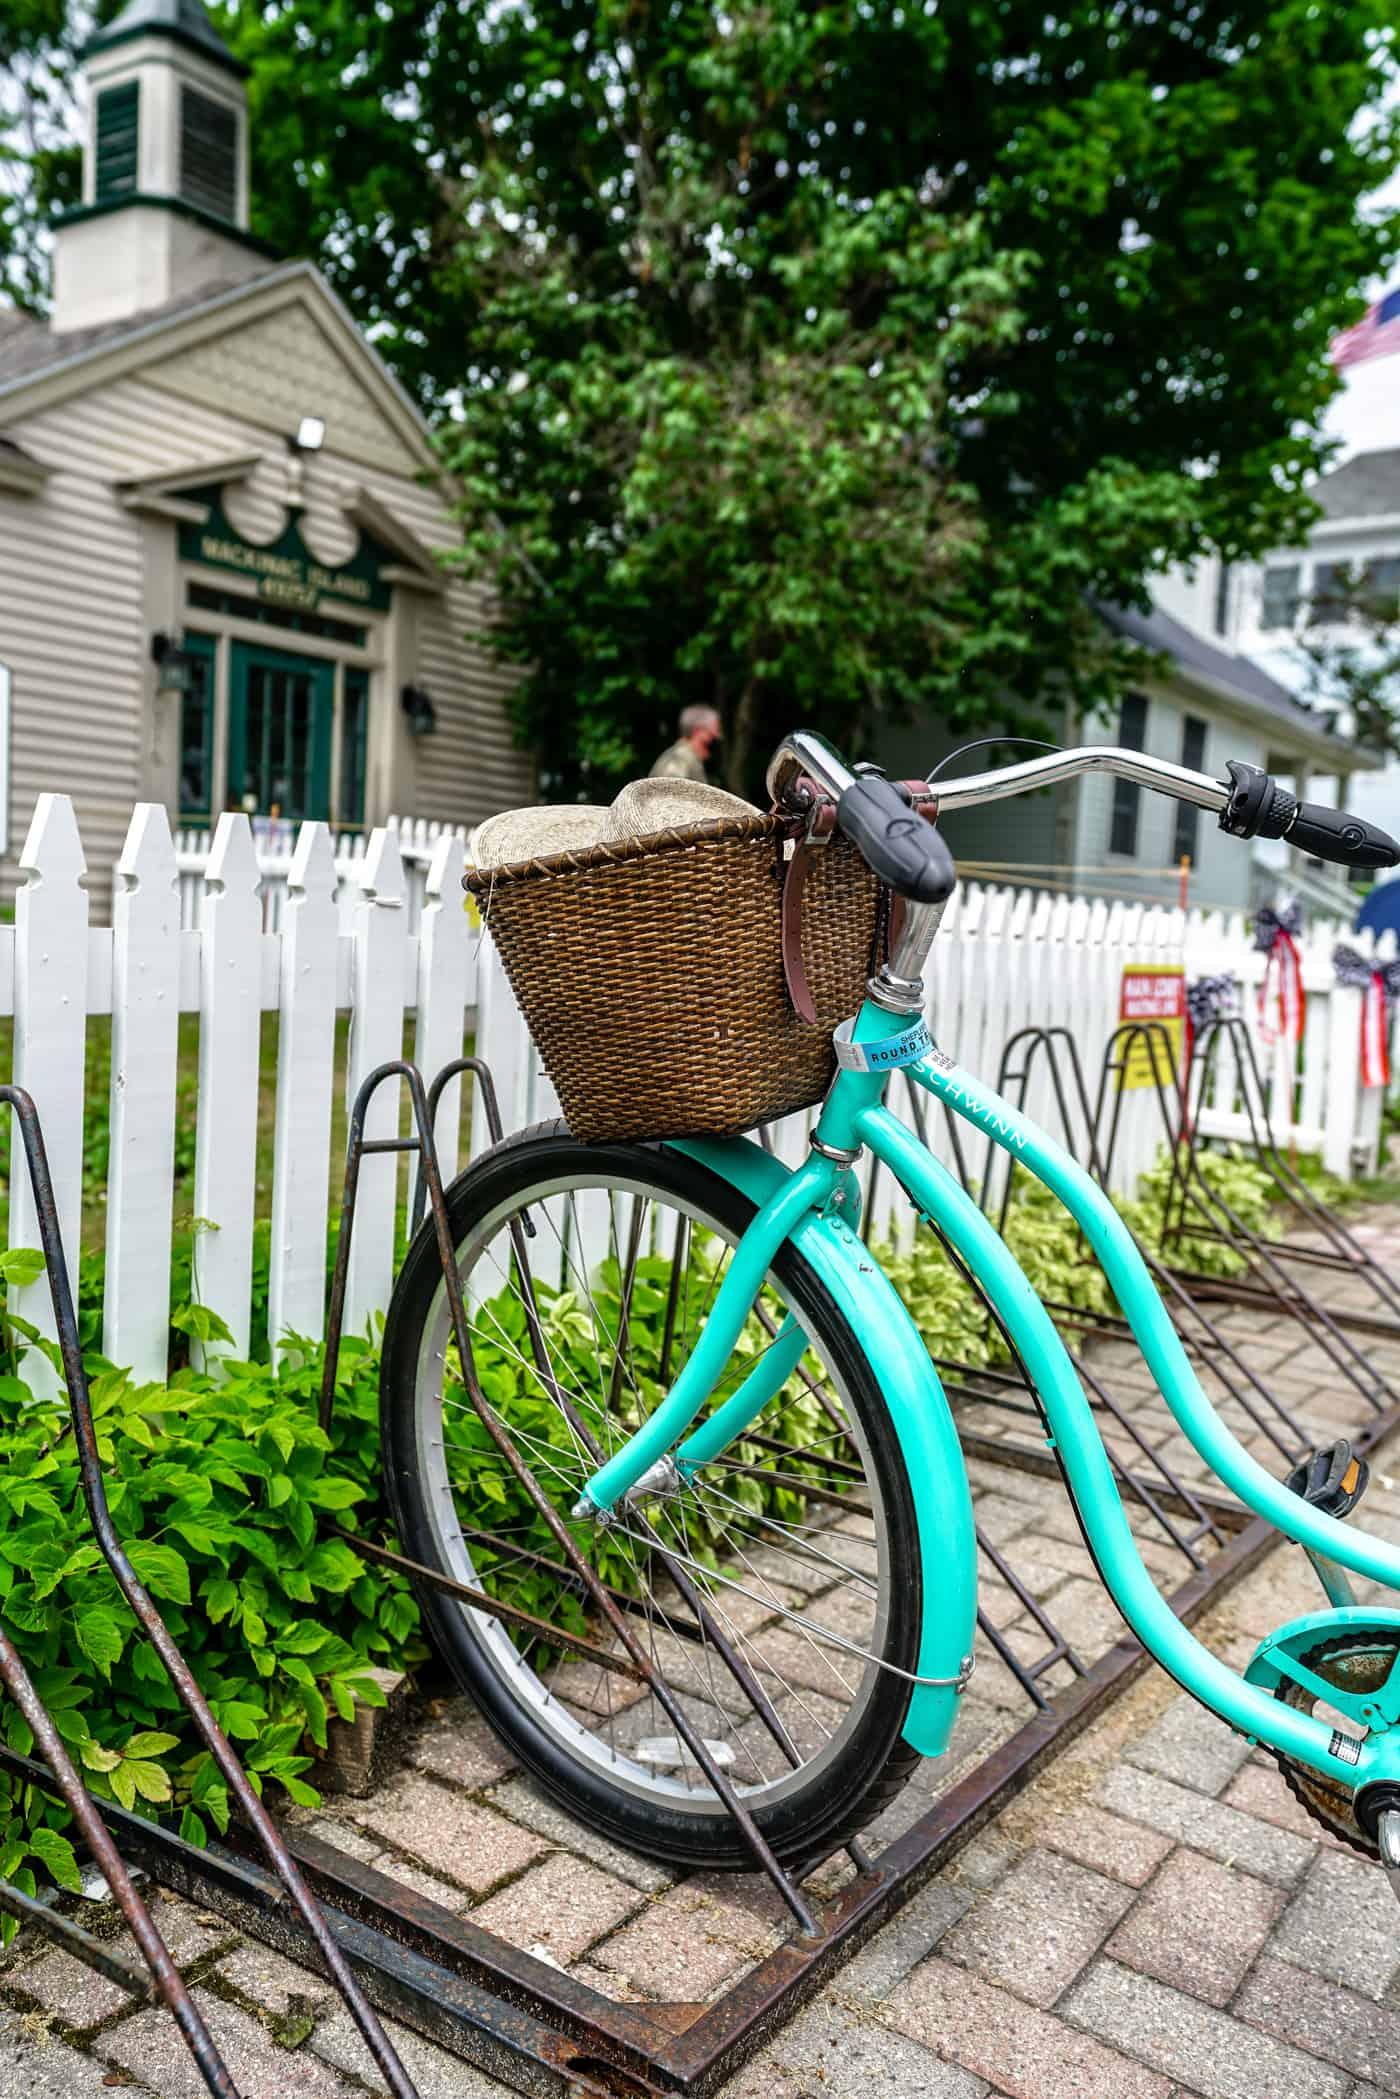 Beach cruiser bike with a basket on Mackinac Island